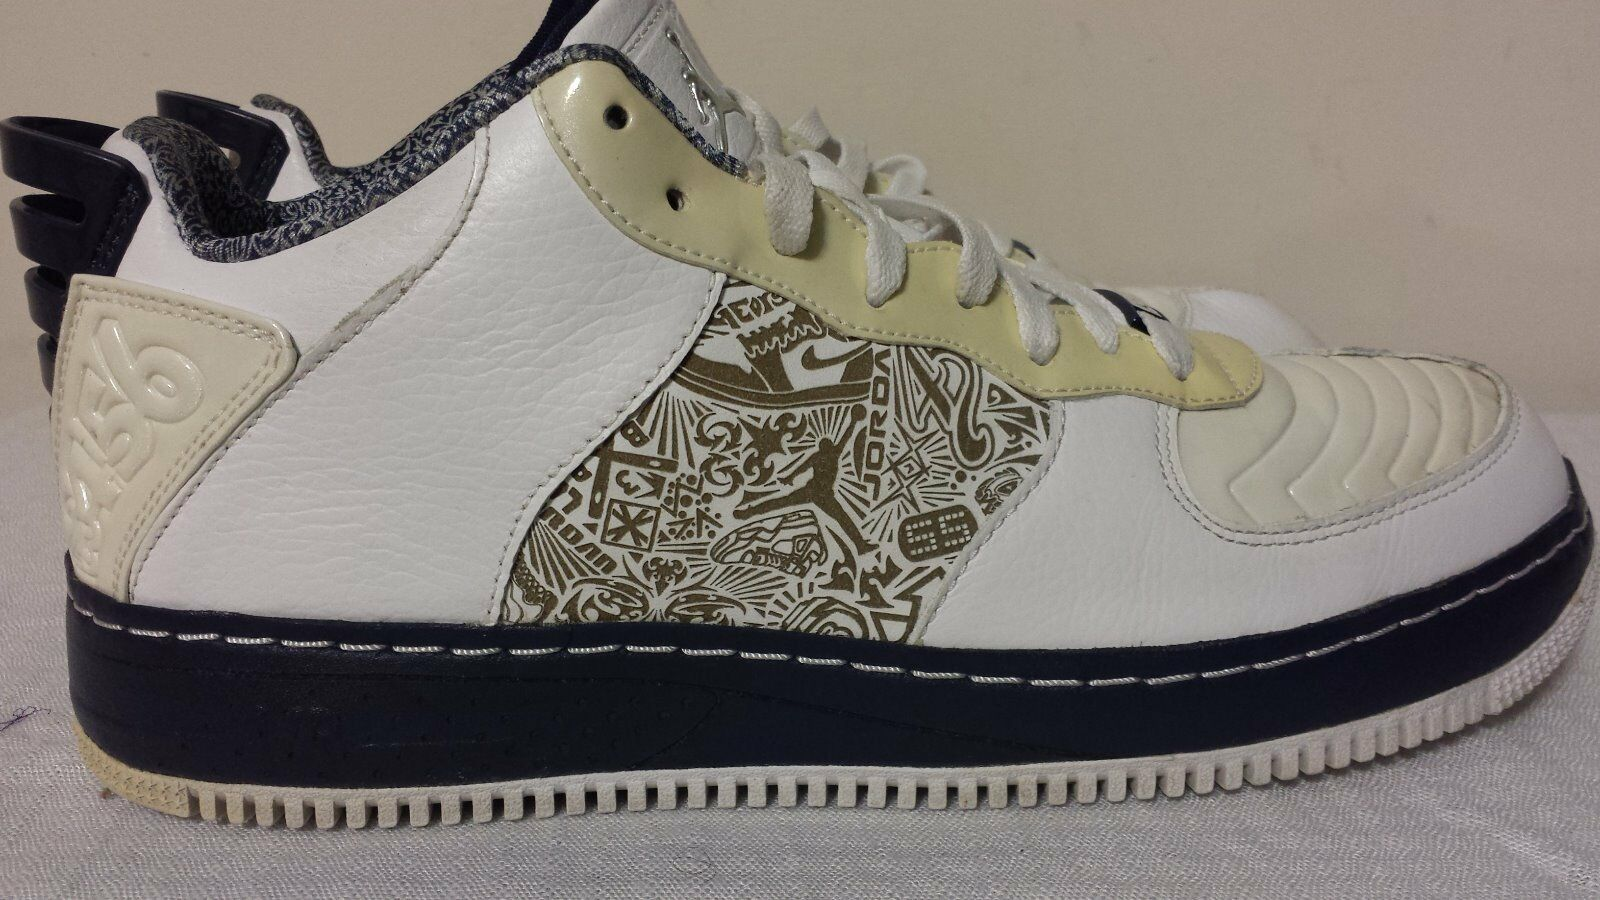 Air Jordan Fusion Force SJF XXPrice reduction Low 332122-103 Men's Shoes US Comfortable Seasonal price cuts, discount benefits